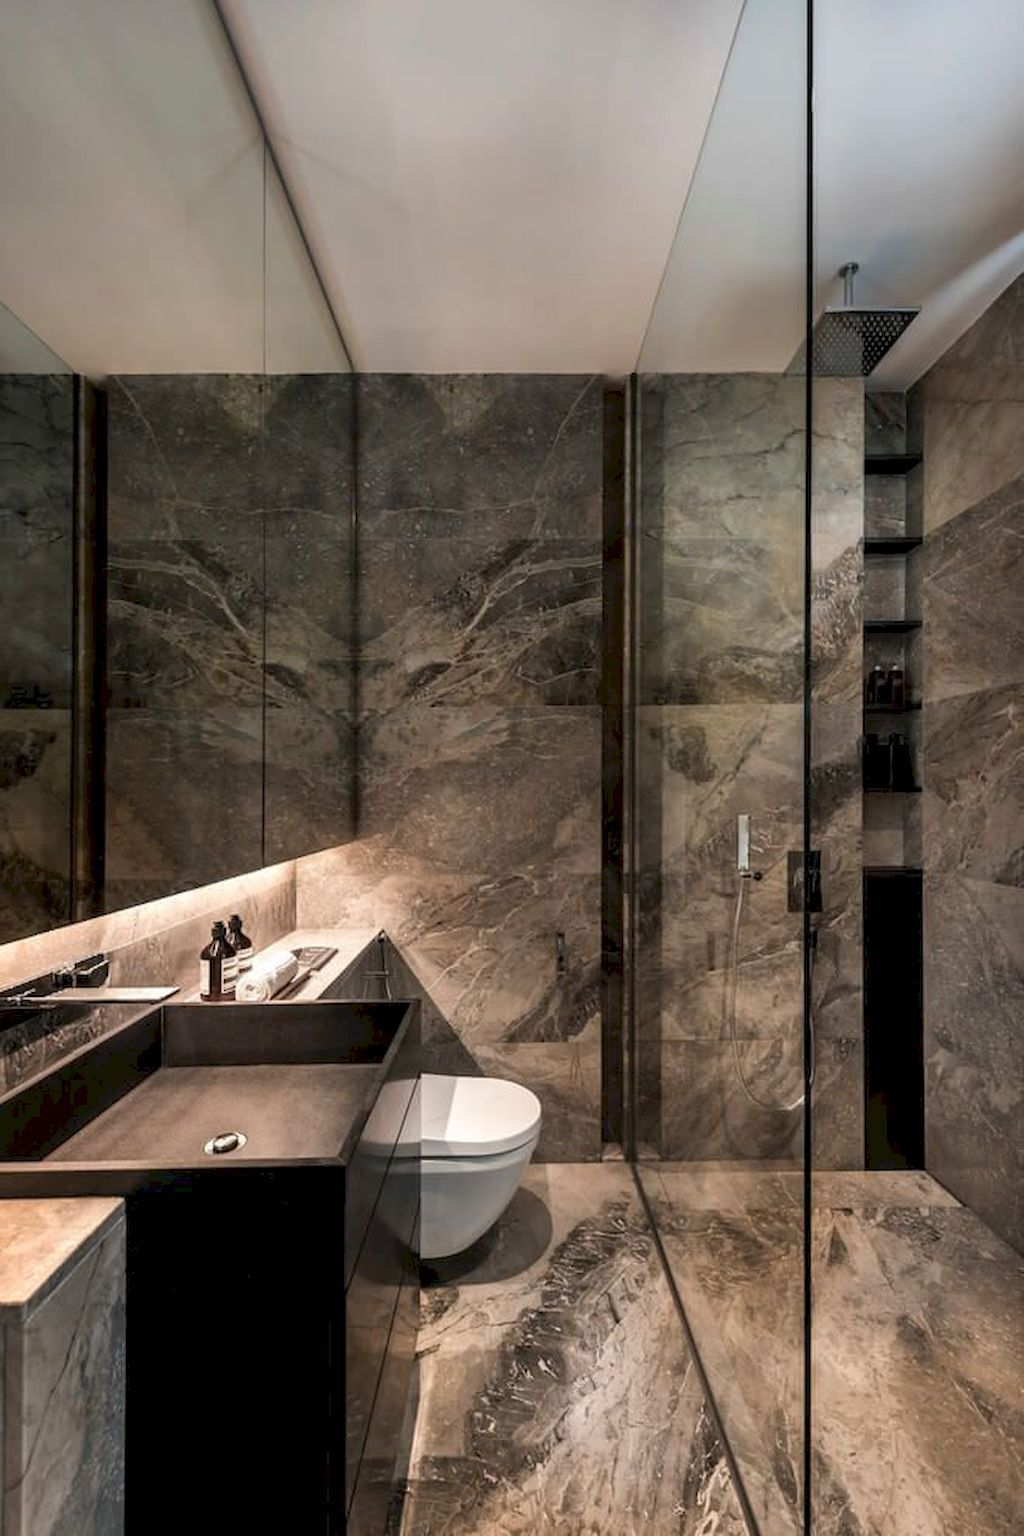 Gorgeous 70 Small Bathroom Remodel With Bathtub Ideas Https Wholiving Com 70 Small Bathroom Remodel Bathtub Ideas ห องน ำโมเด ร น ตกแต งภายใน การออกแบบภายใน